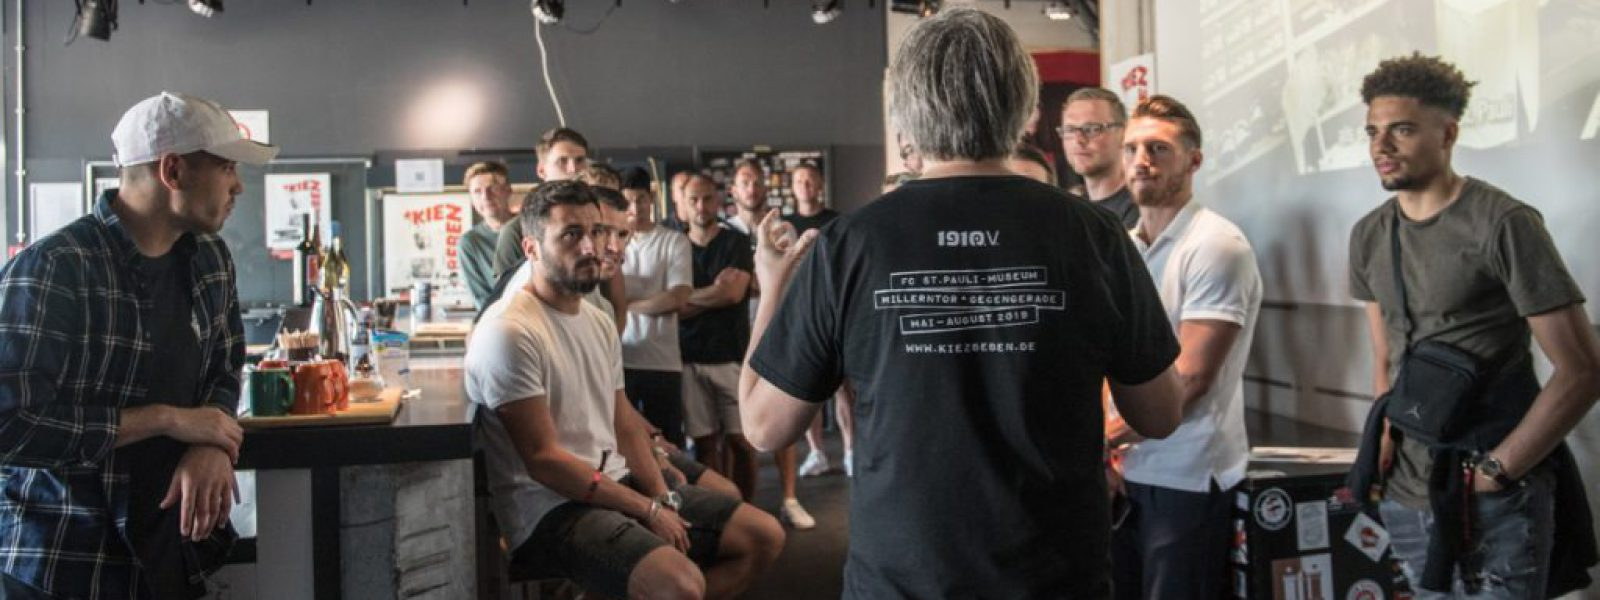 2019_0623 FC St Pauli erste Mannschaft im KIEZBEBEN (Foto Sabrina Adeline Nagel) - 3